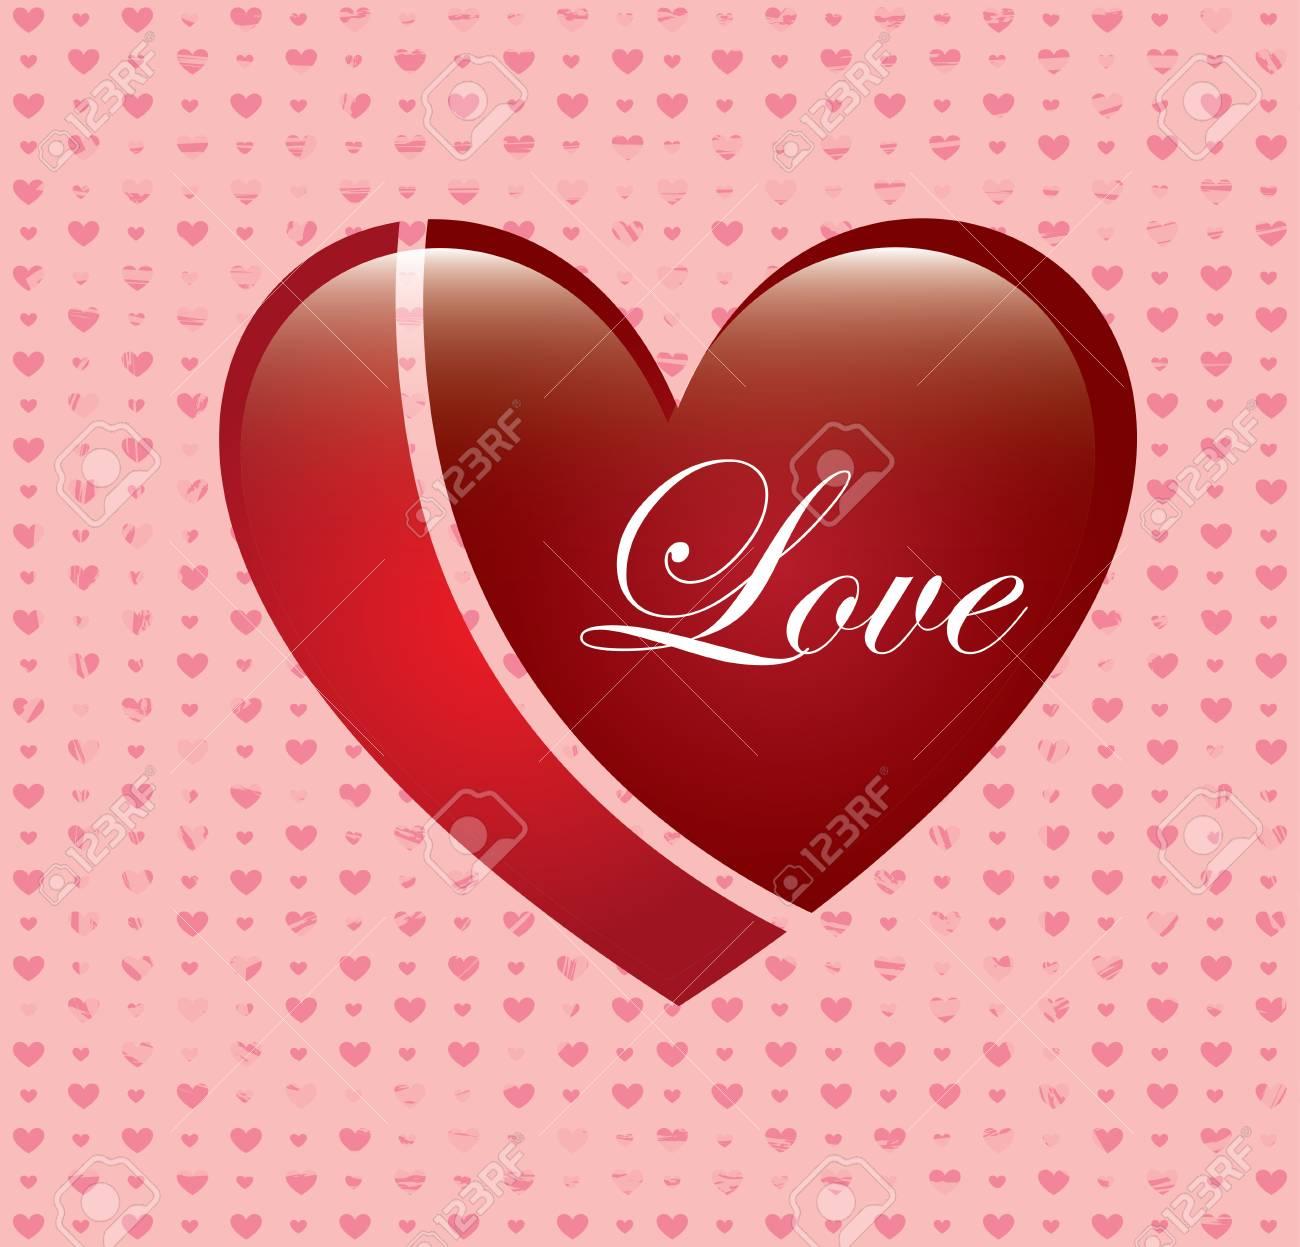 love heart over pink background vector illustration Stock Vector - 22327228